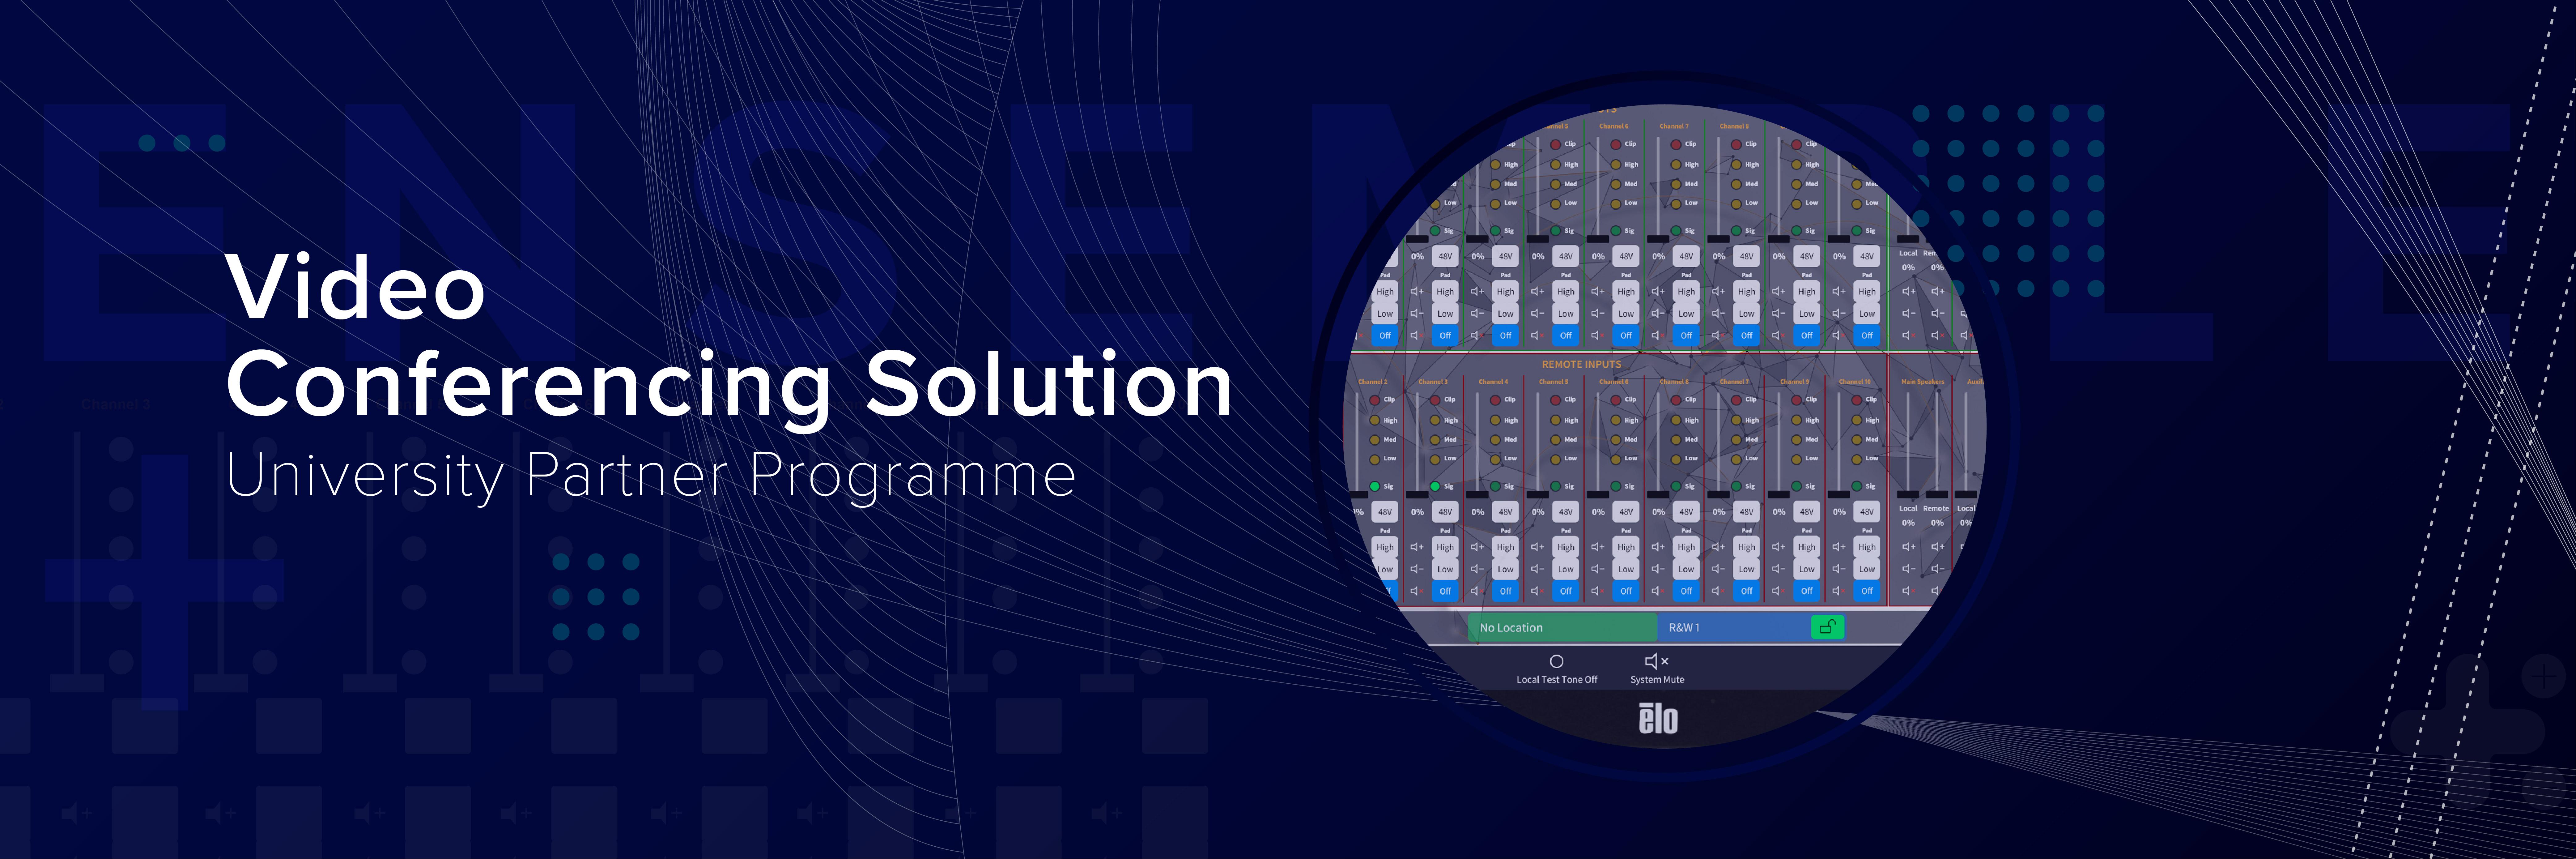 Ensemble + University Partner Programme Video Conferencing Solution